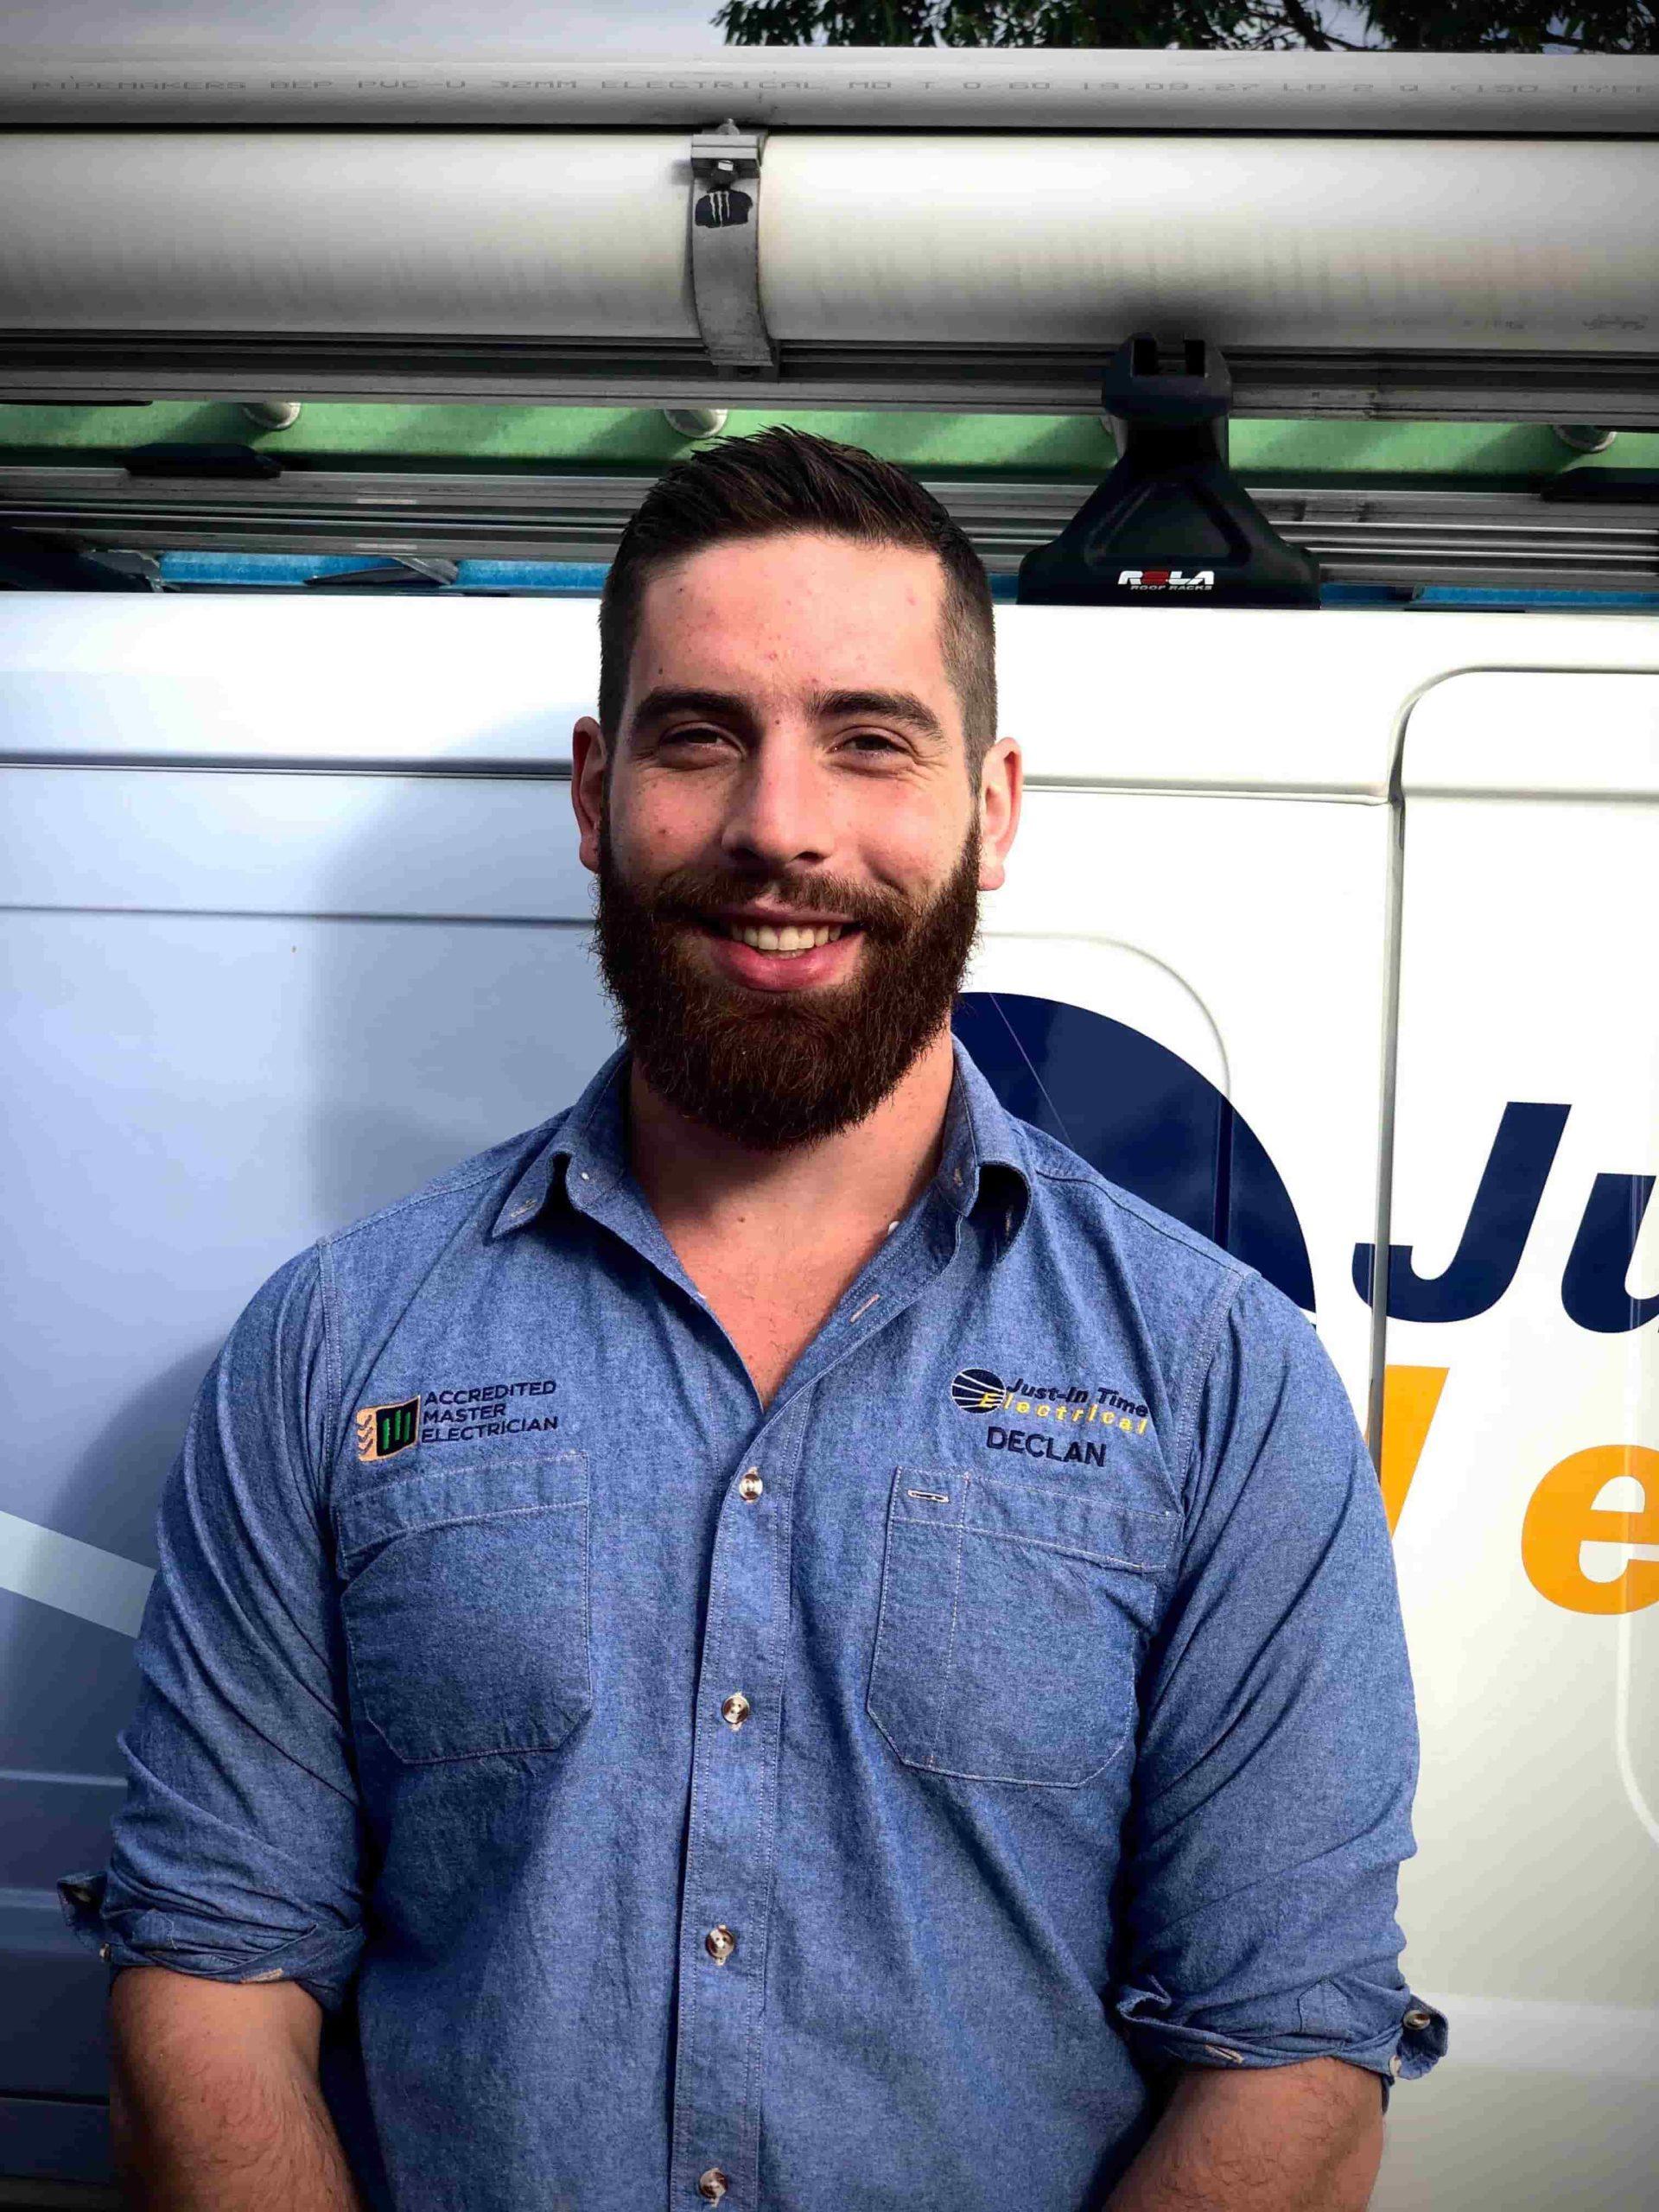 Declan Wreford electrical apprentice